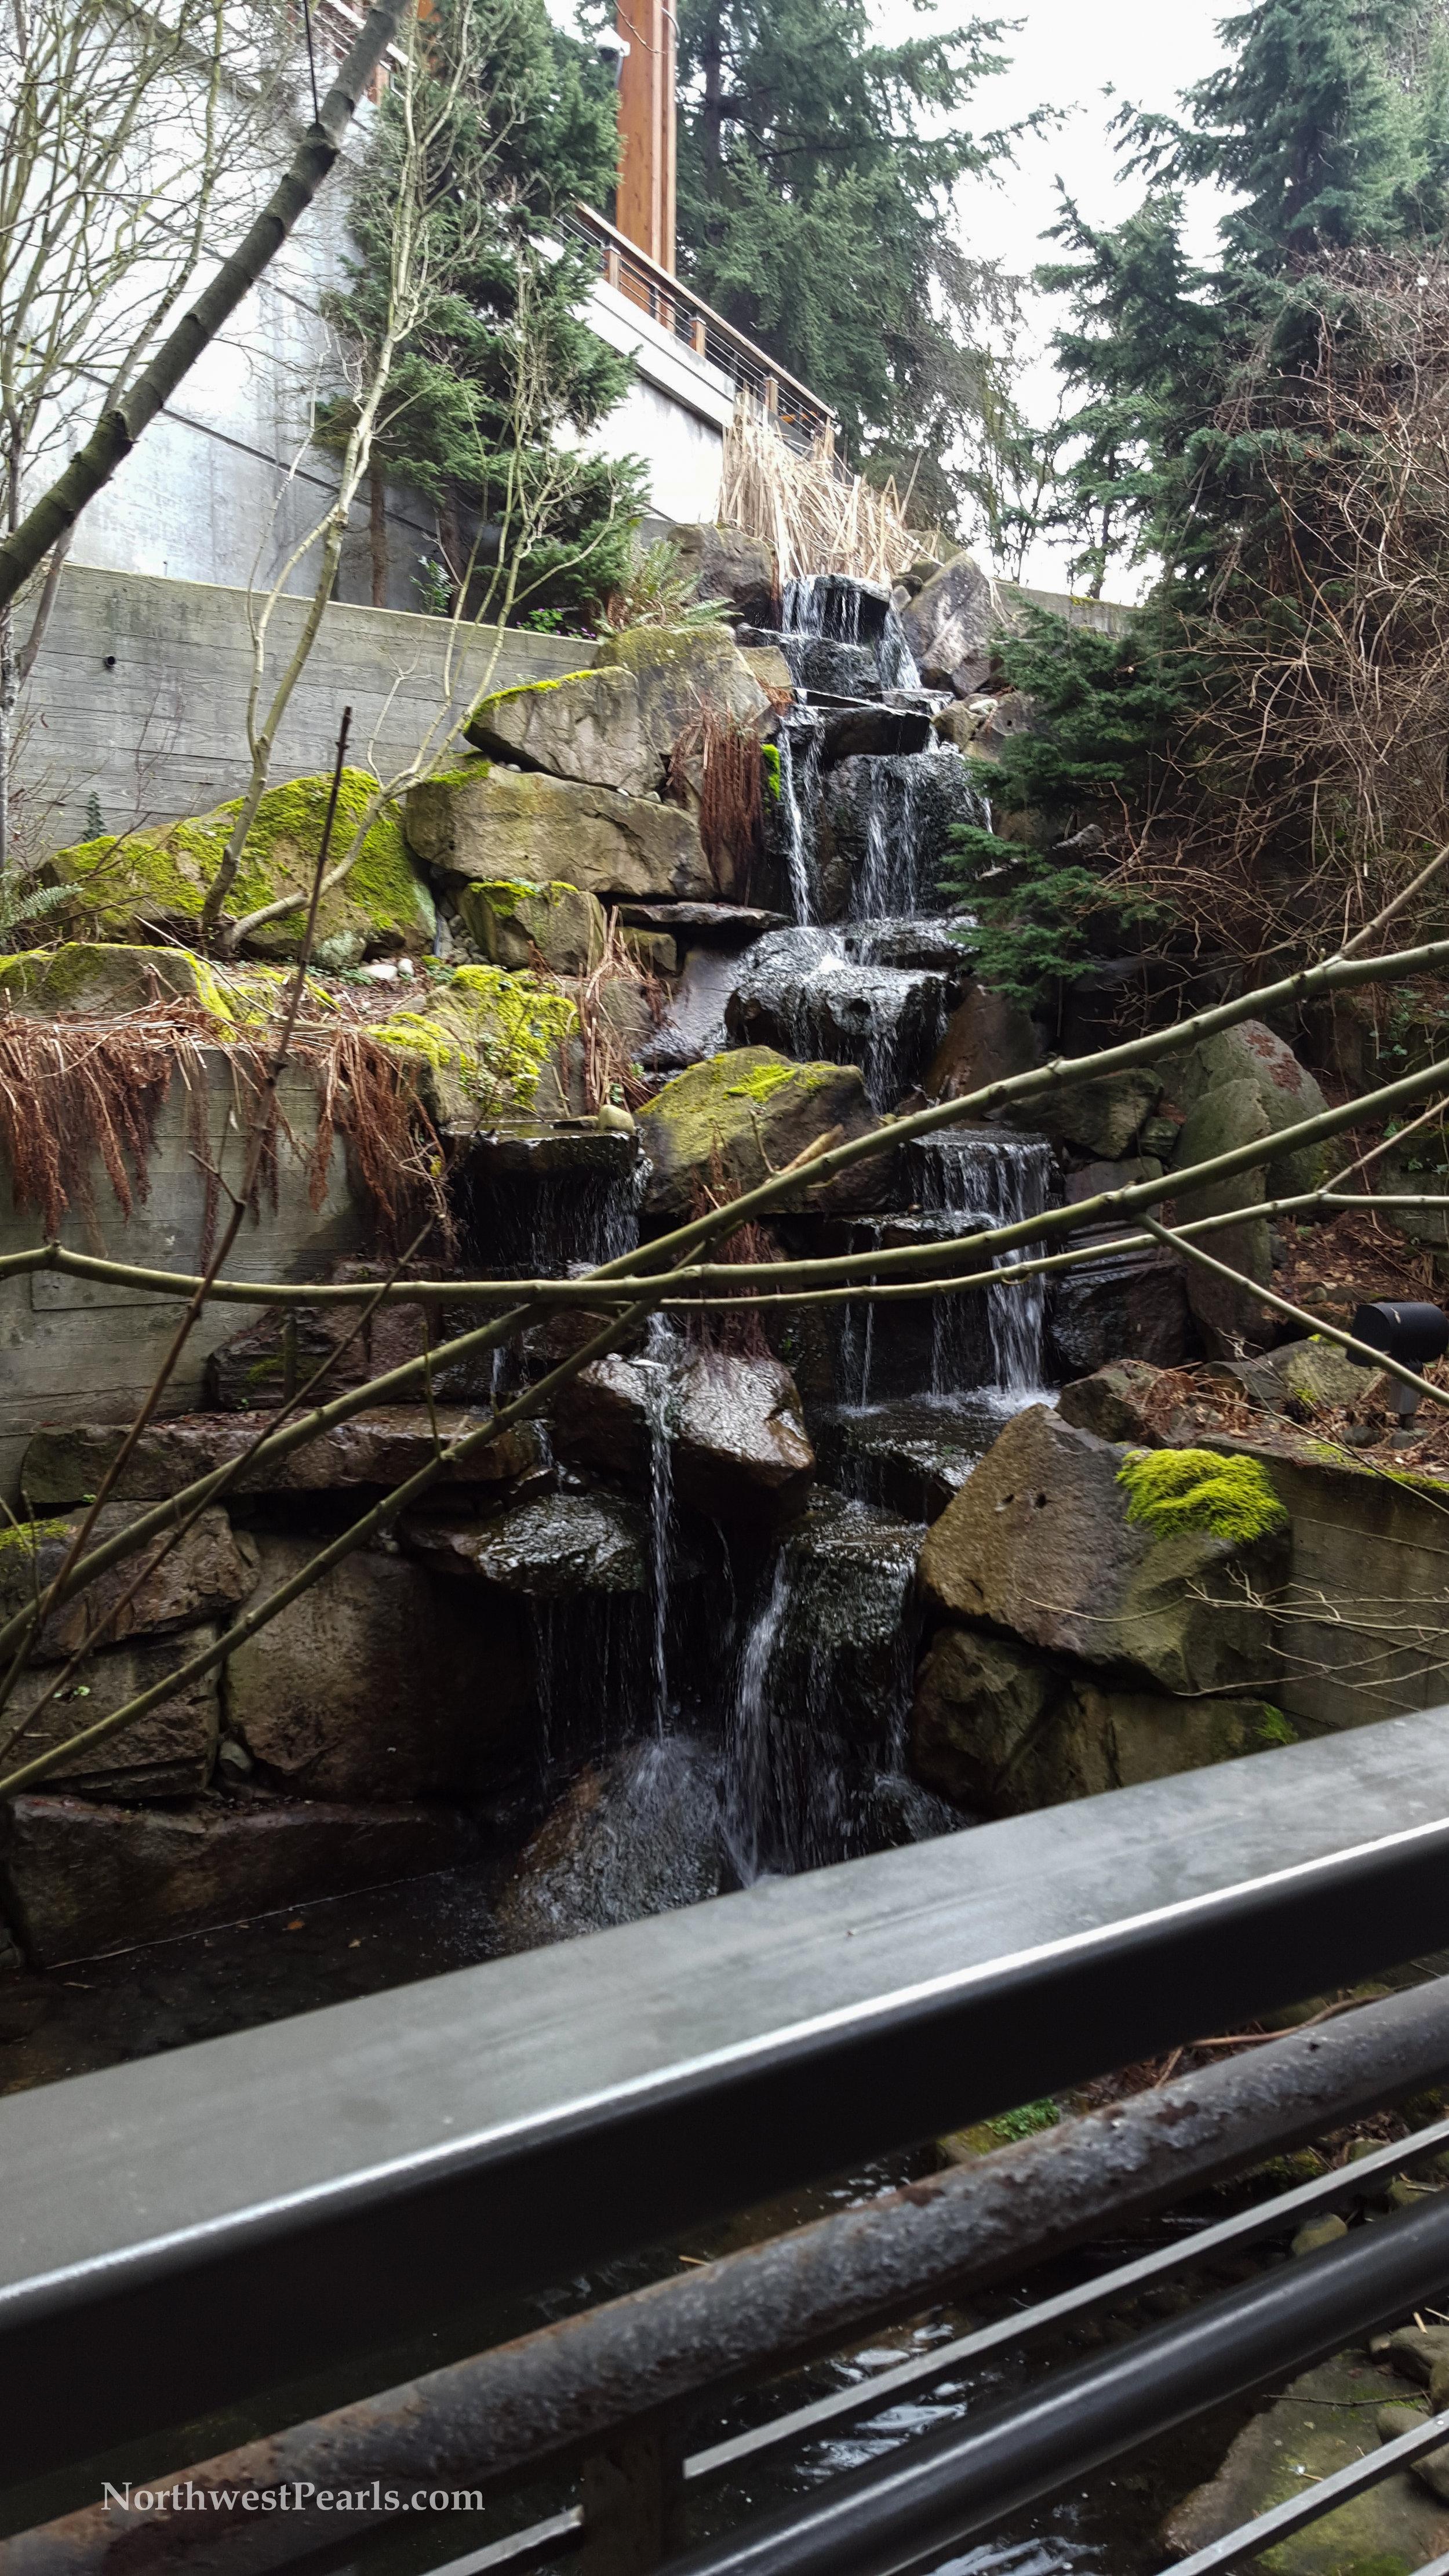 Northwest Pearls: REI Seattle